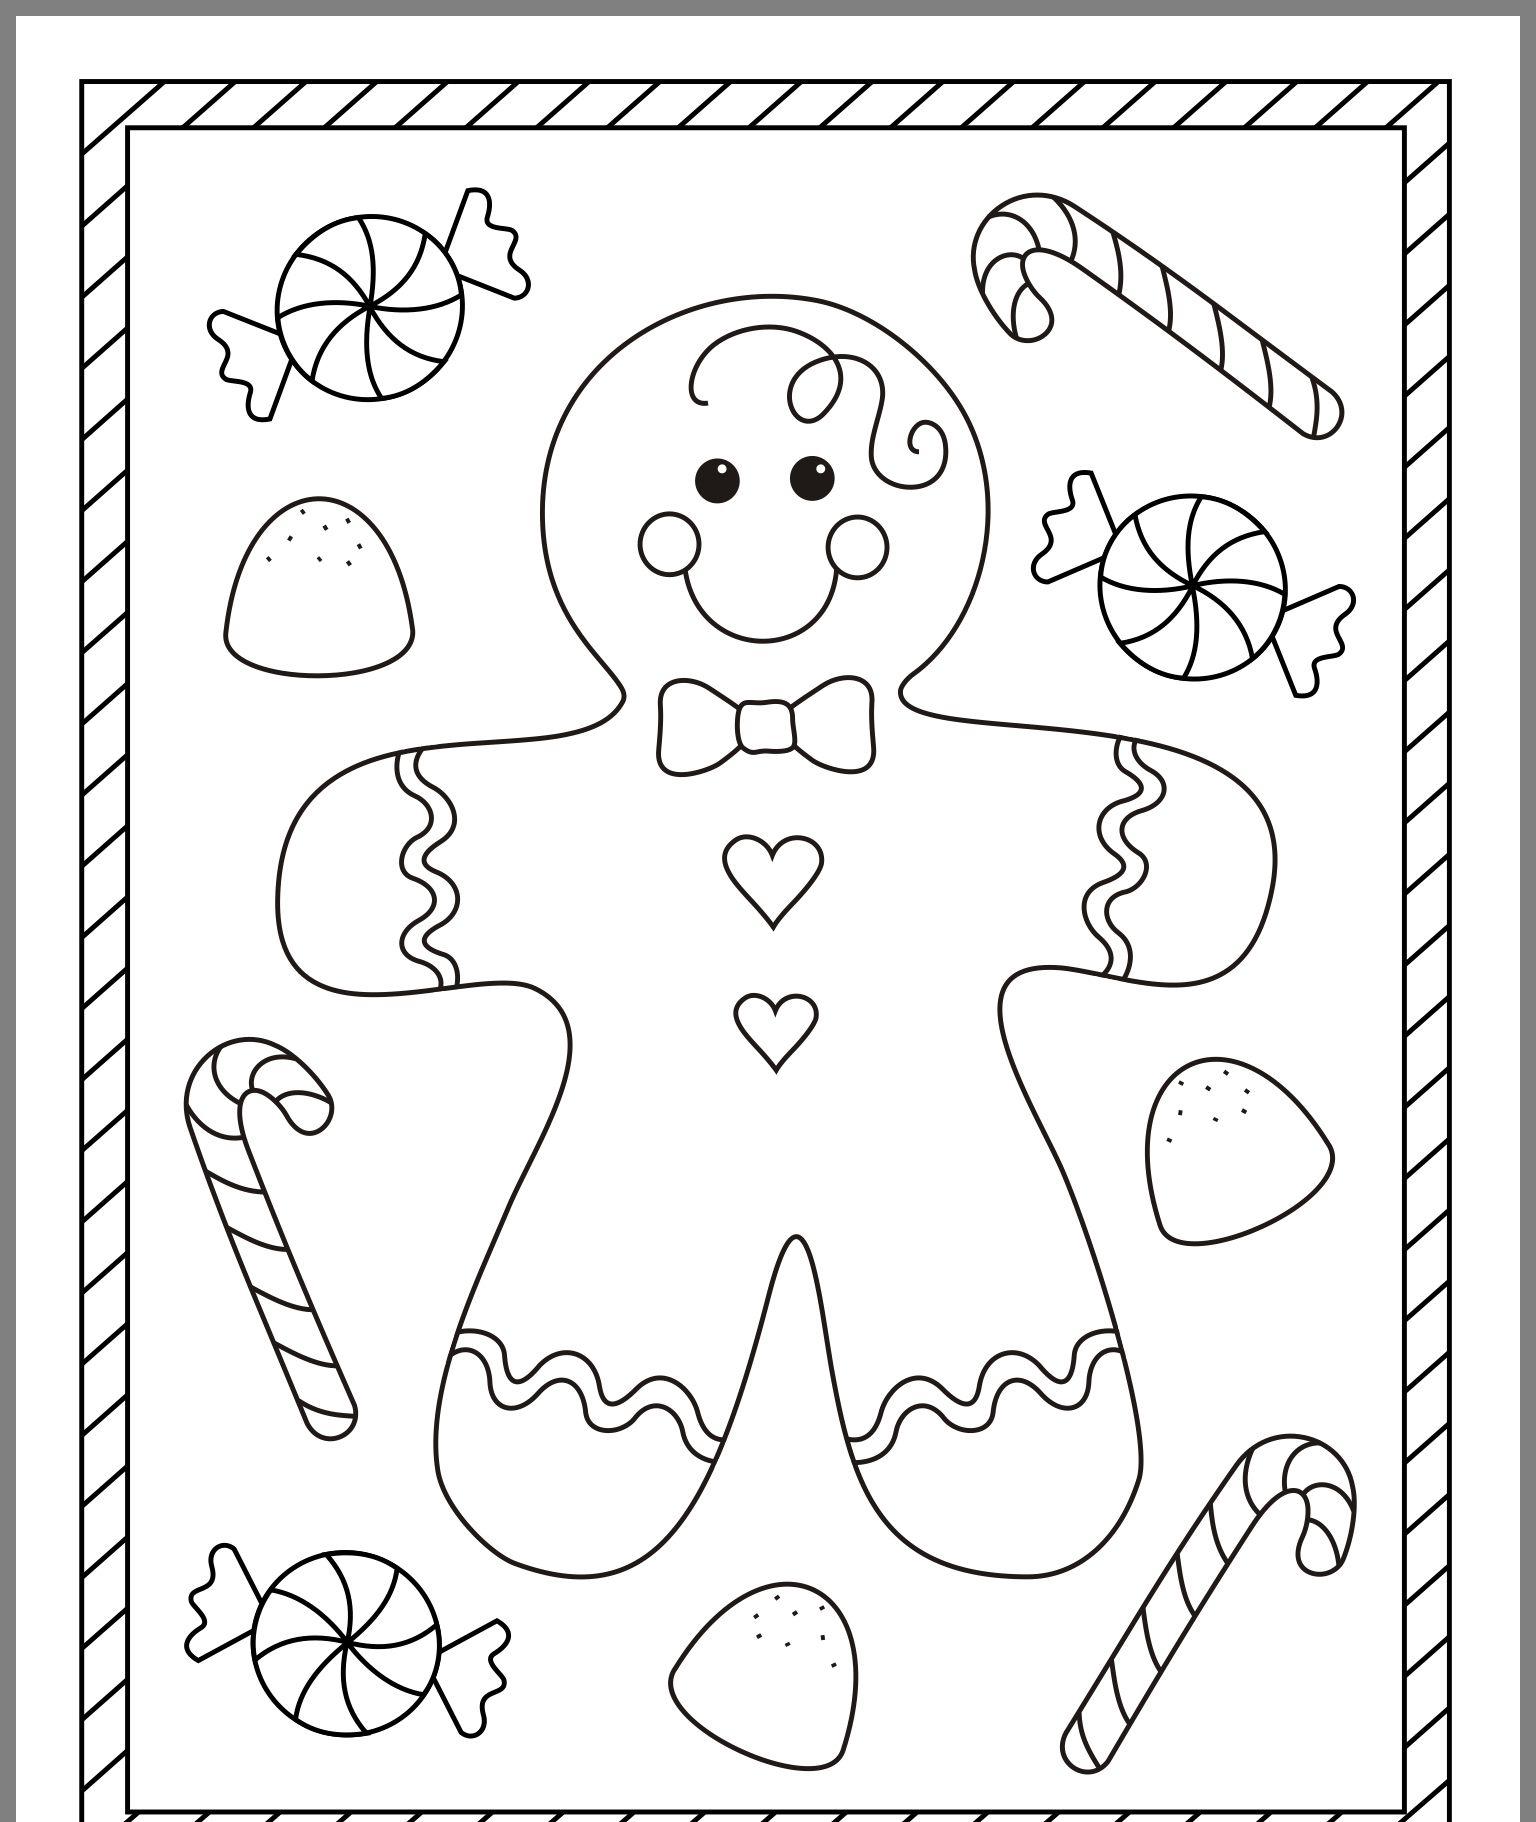 Pin By Sara Mcintyre On Christmas Printable Christmas Coloring Pages Free Christmas Coloring Pages Preschool Christmas [ 1822 x 1536 Pixel ]